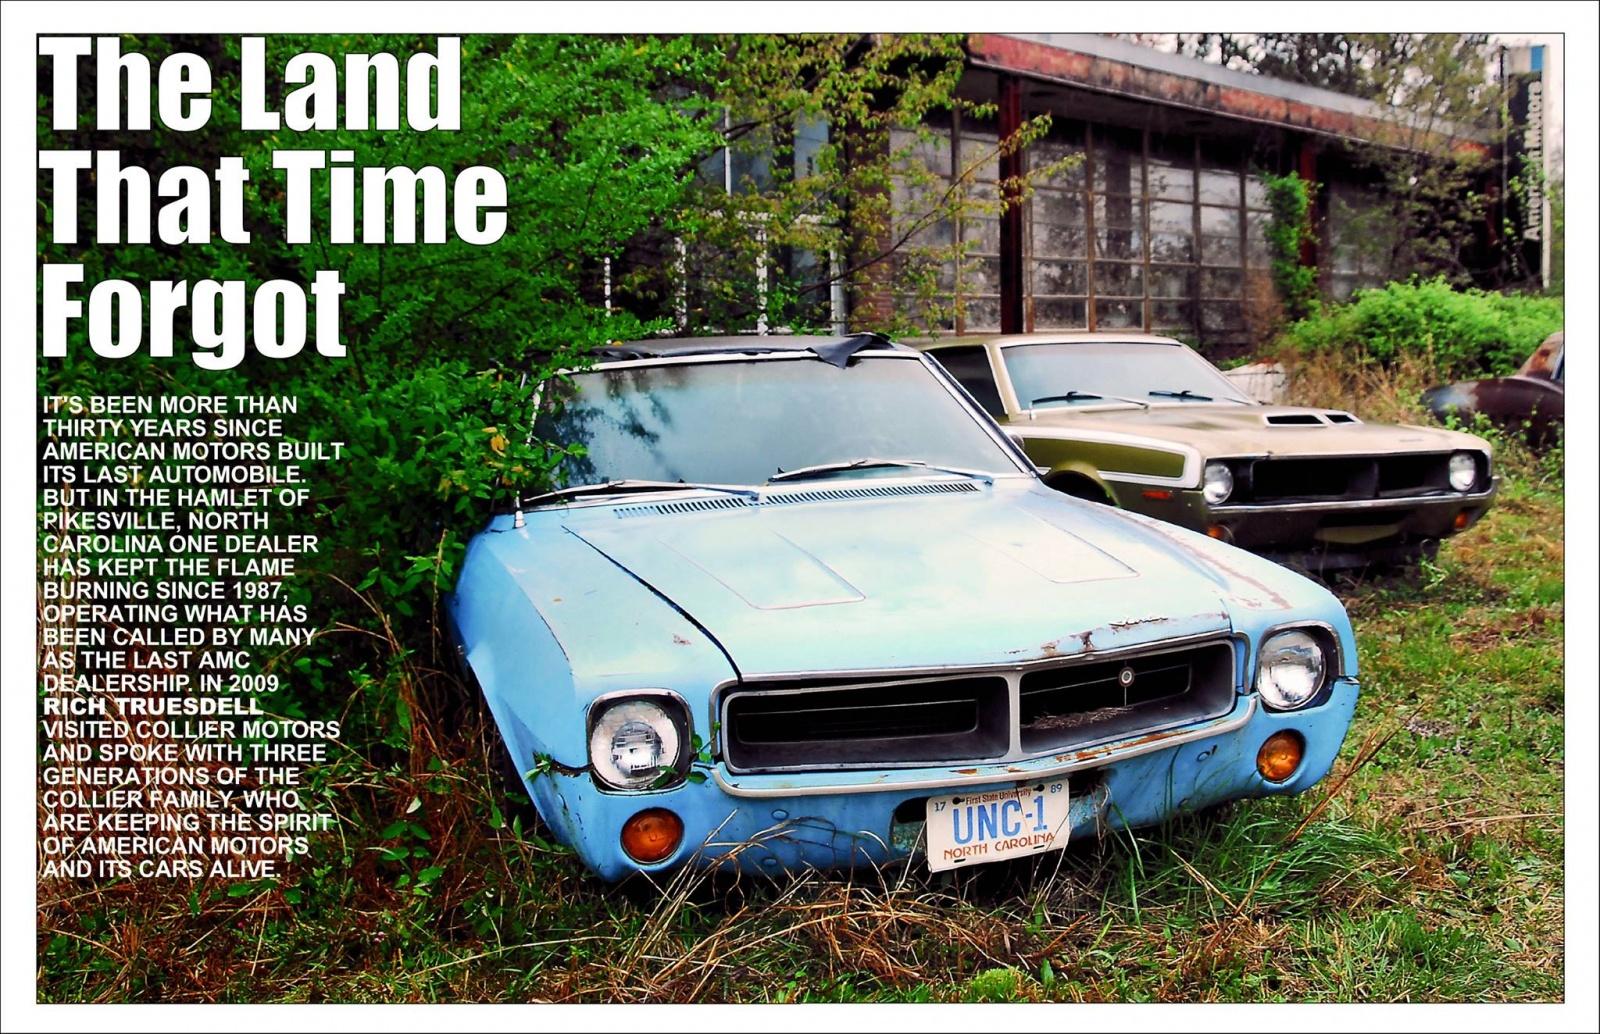 American Auto Sales Nc: Former AMC Dealership Full Of Cars